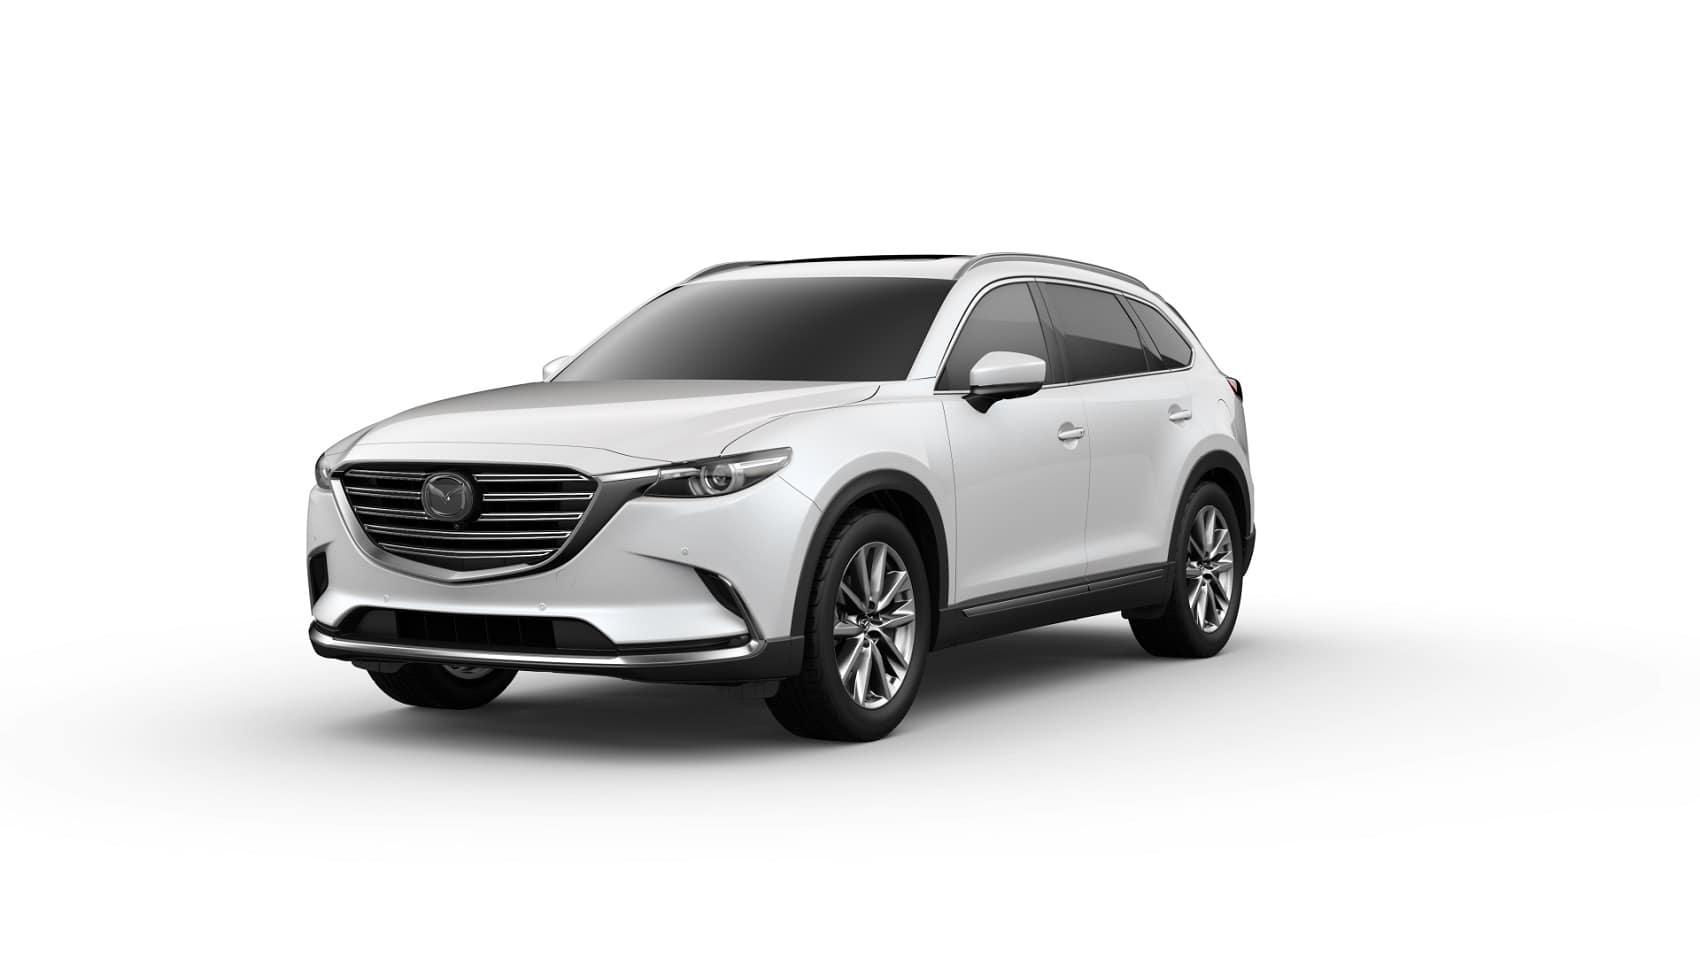 2020 Mazda CX-9 GT Snowflake White Pearl